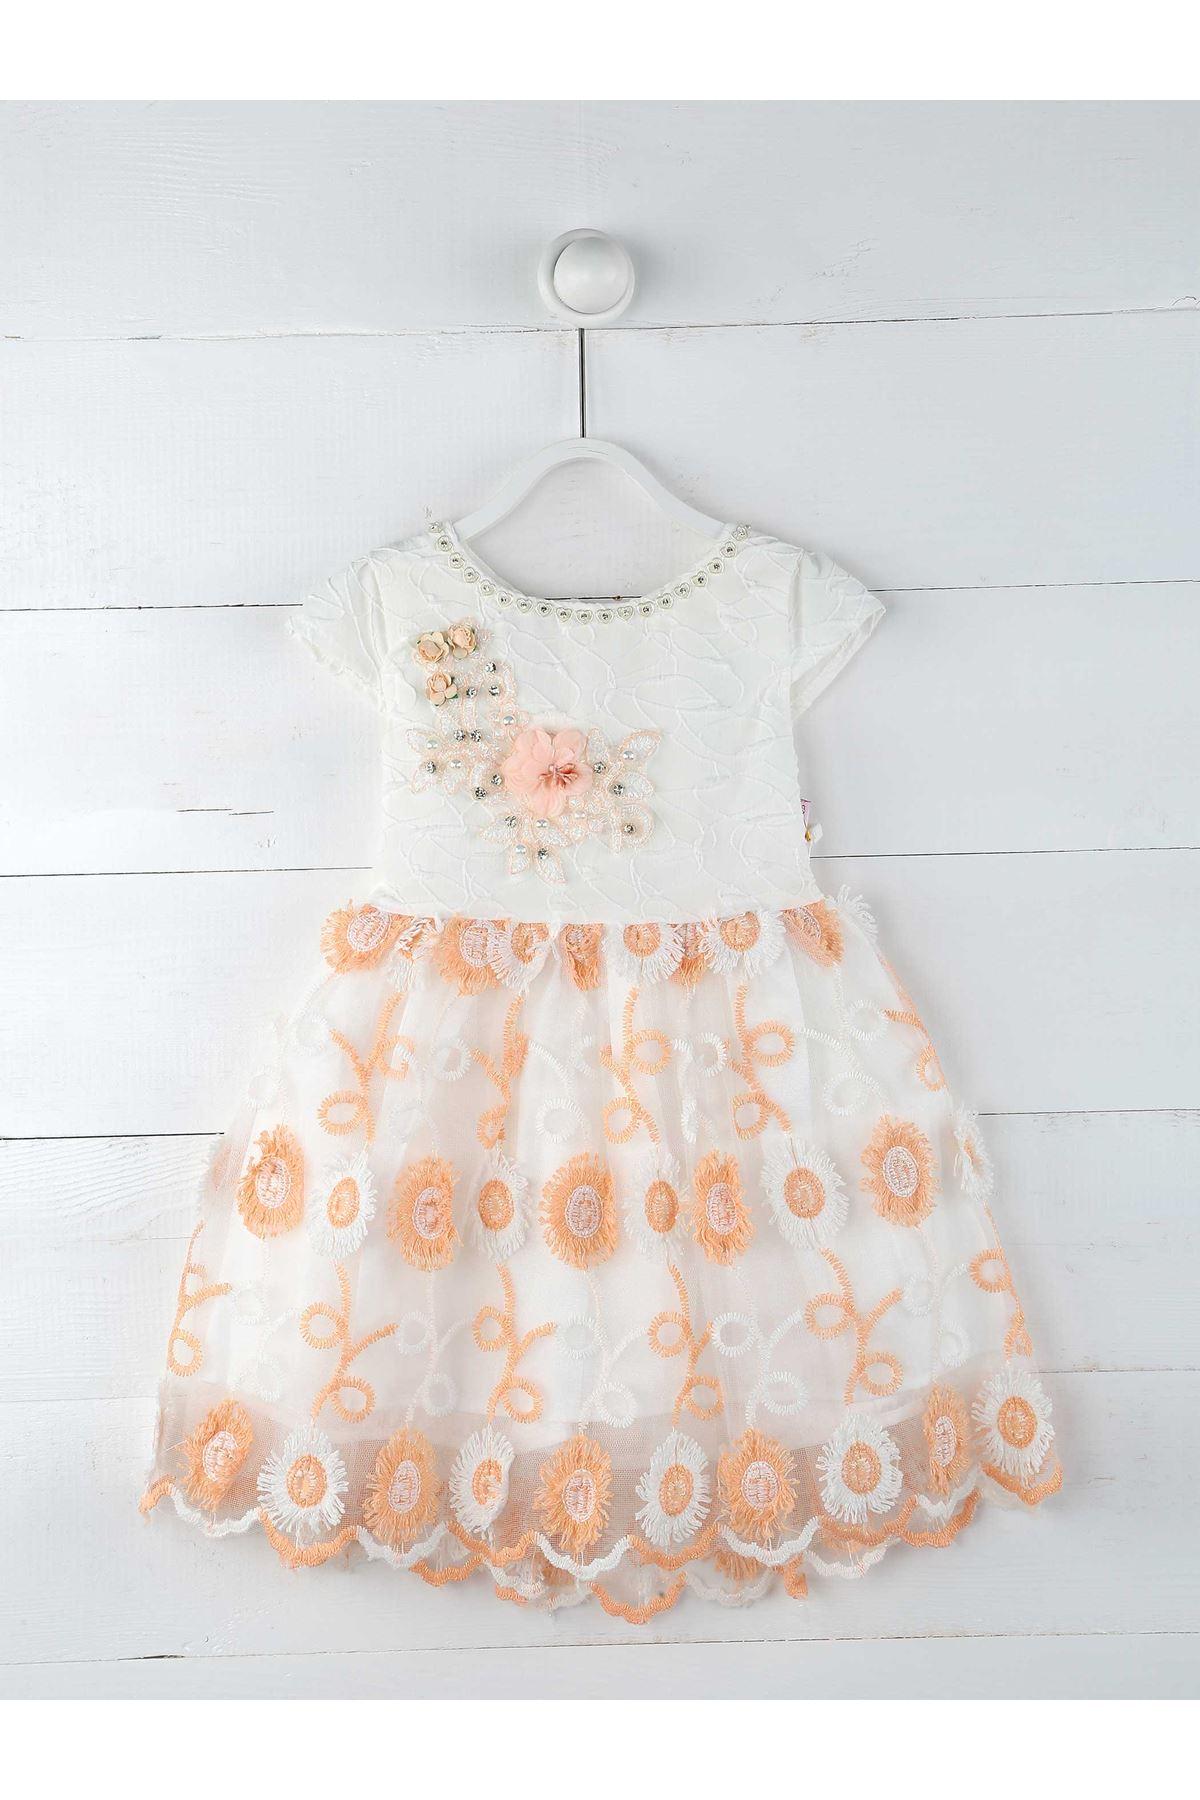 White Salmon Girl Kids Evening Gown